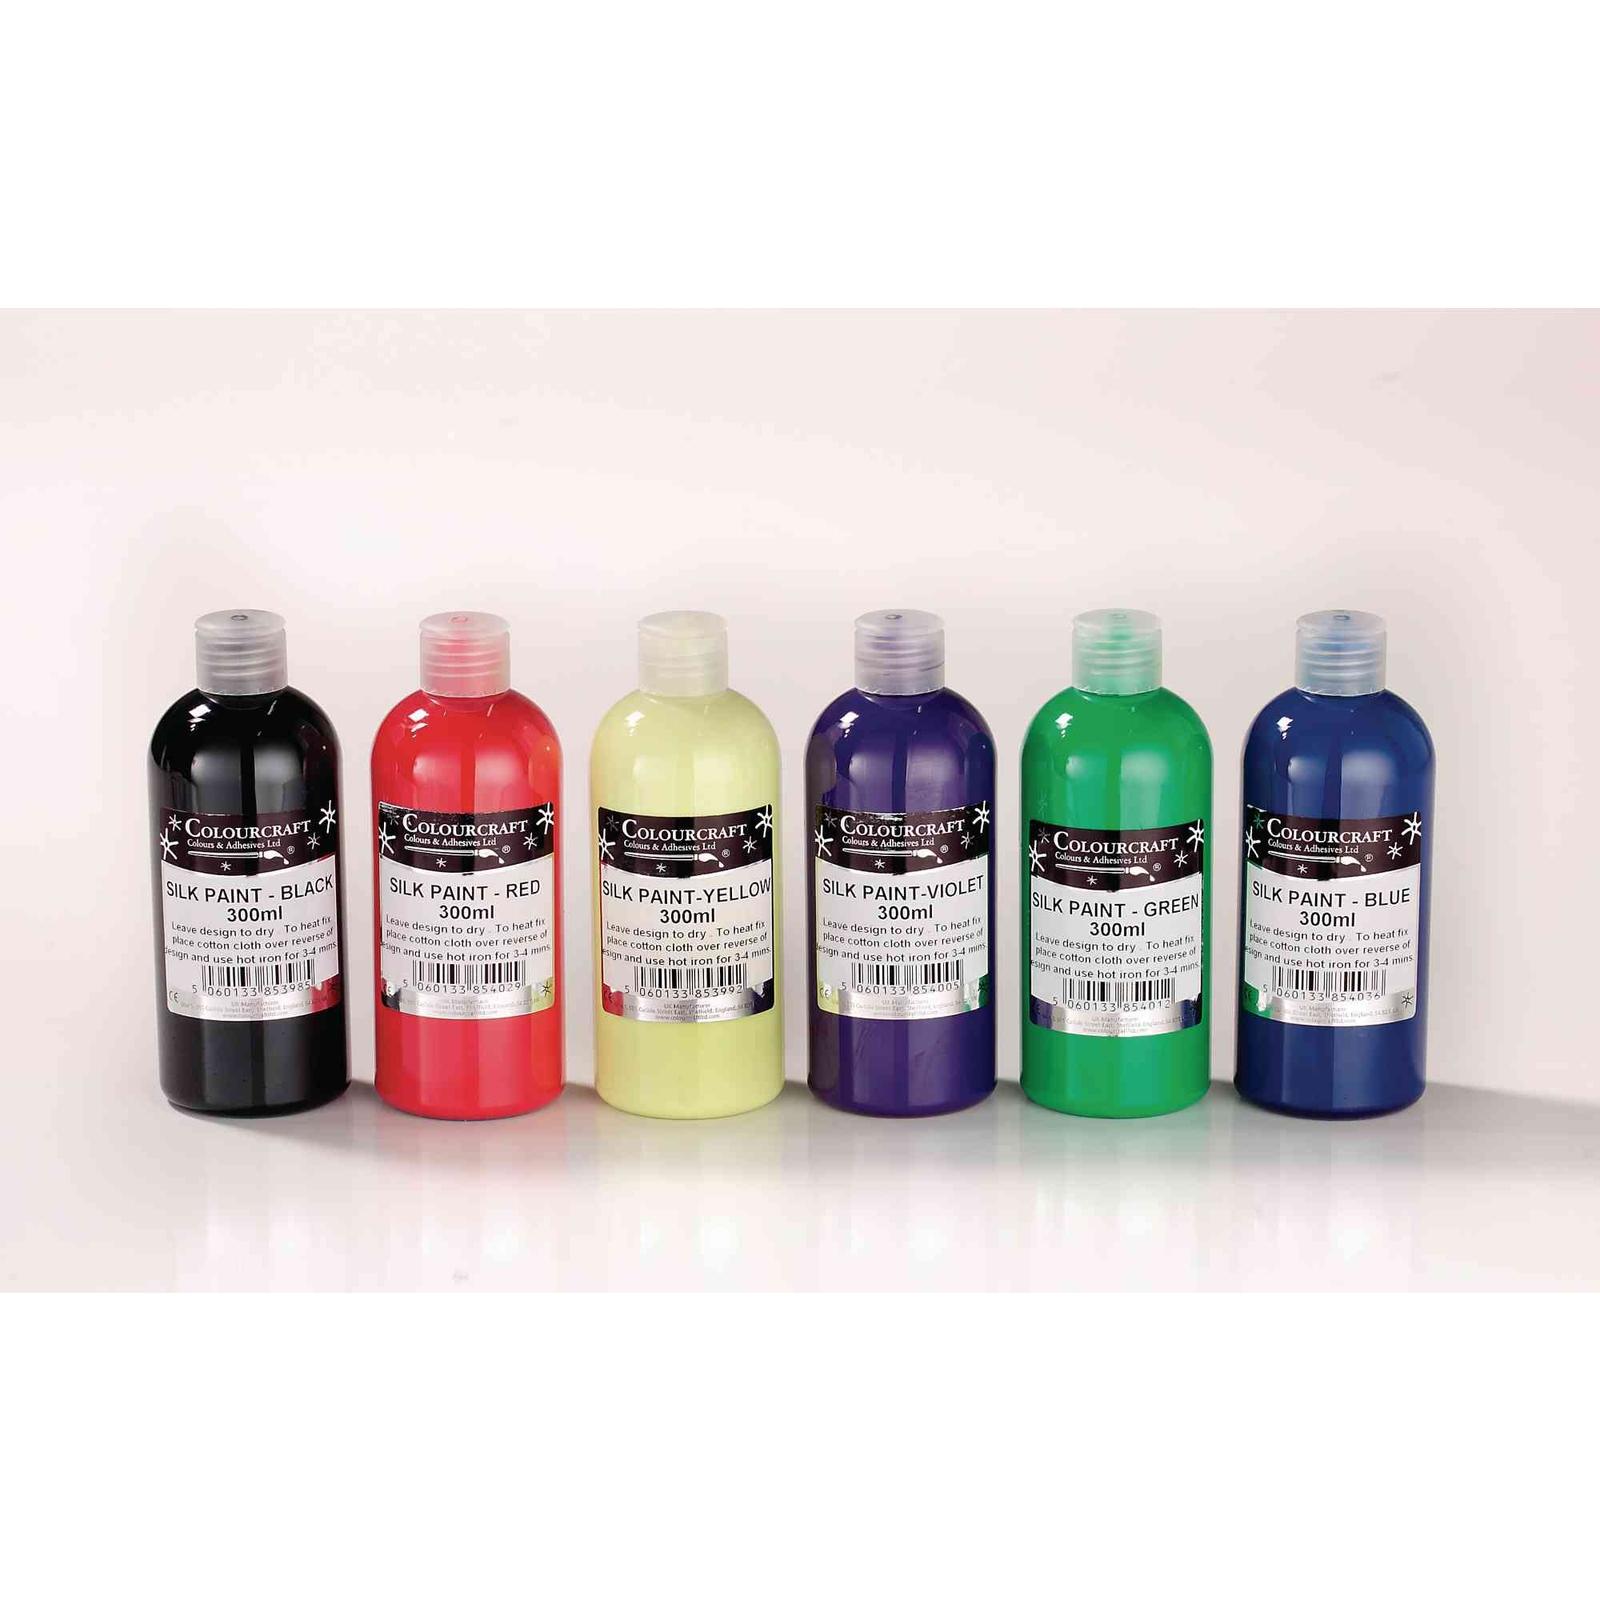 Colourcraft Silk Paint - Black